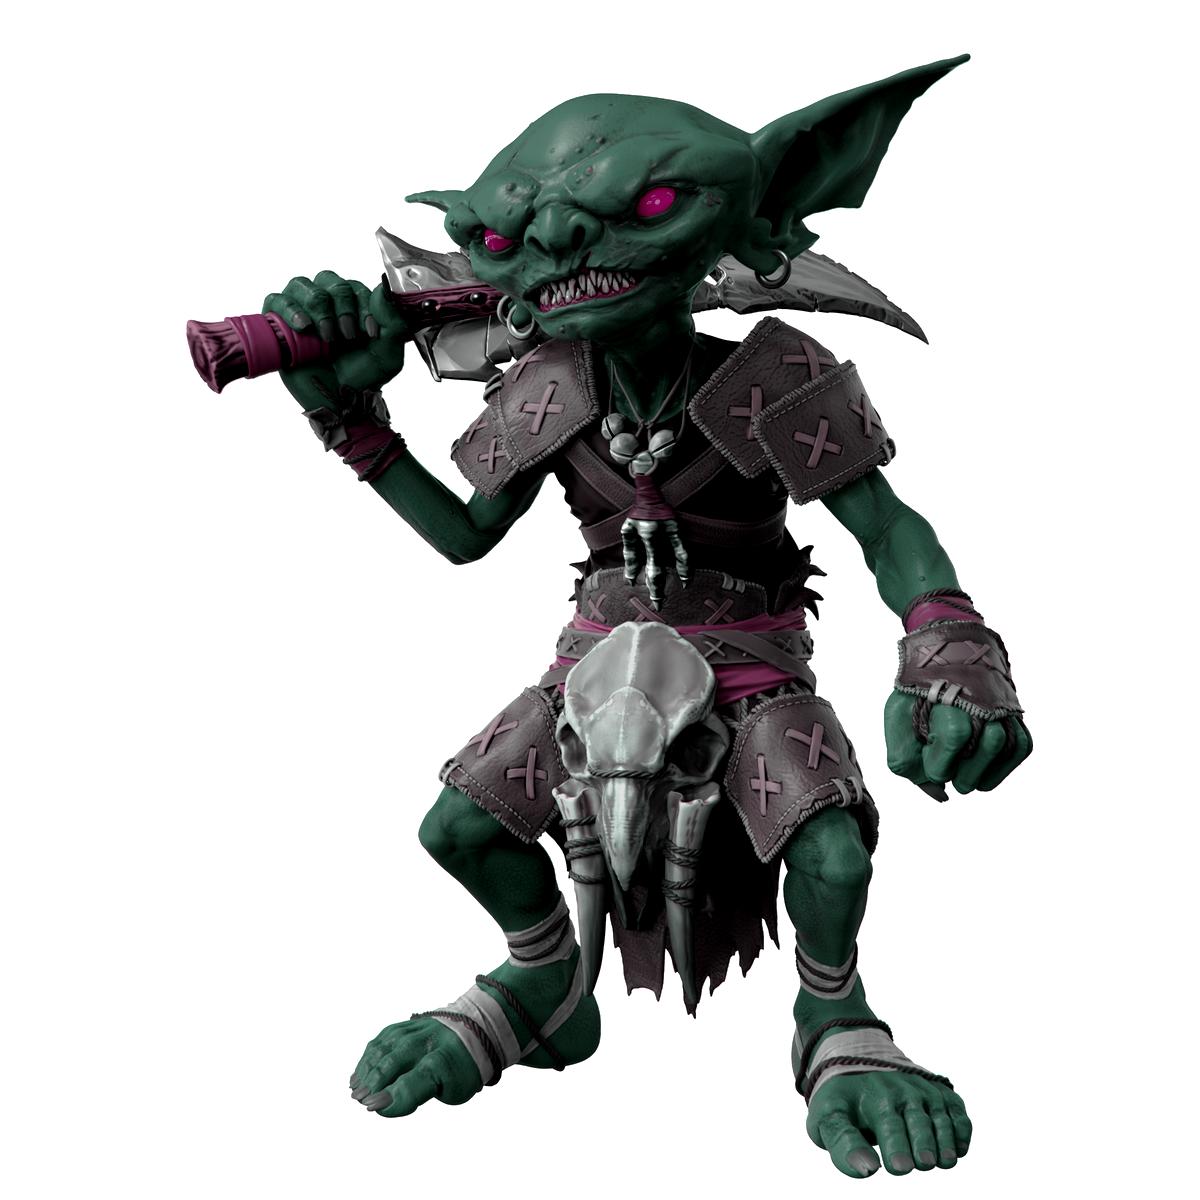 Pathfinder replique life sized goblin